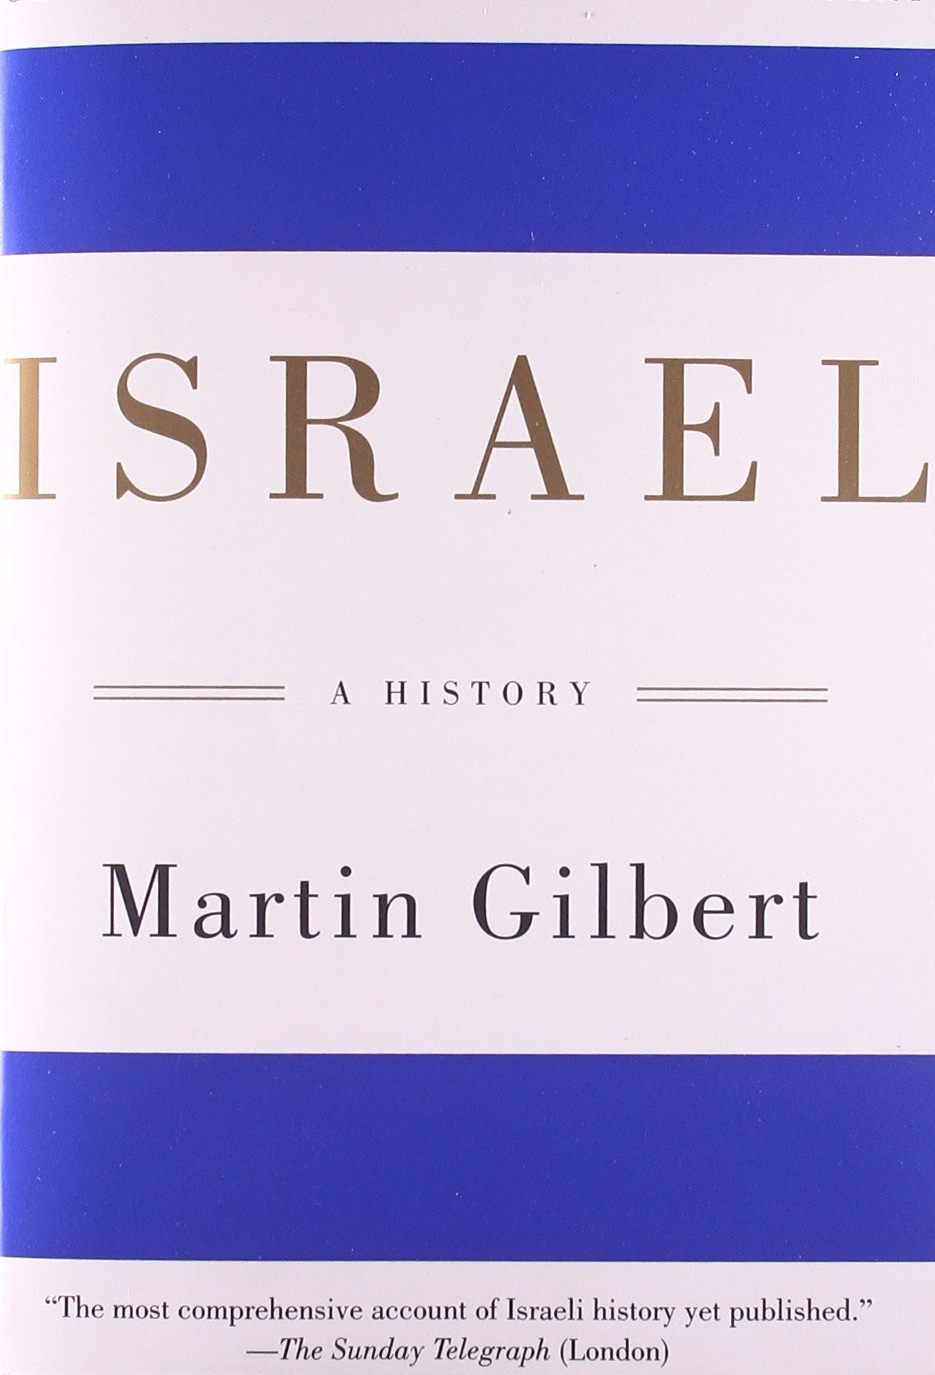 Israel A History.jpg